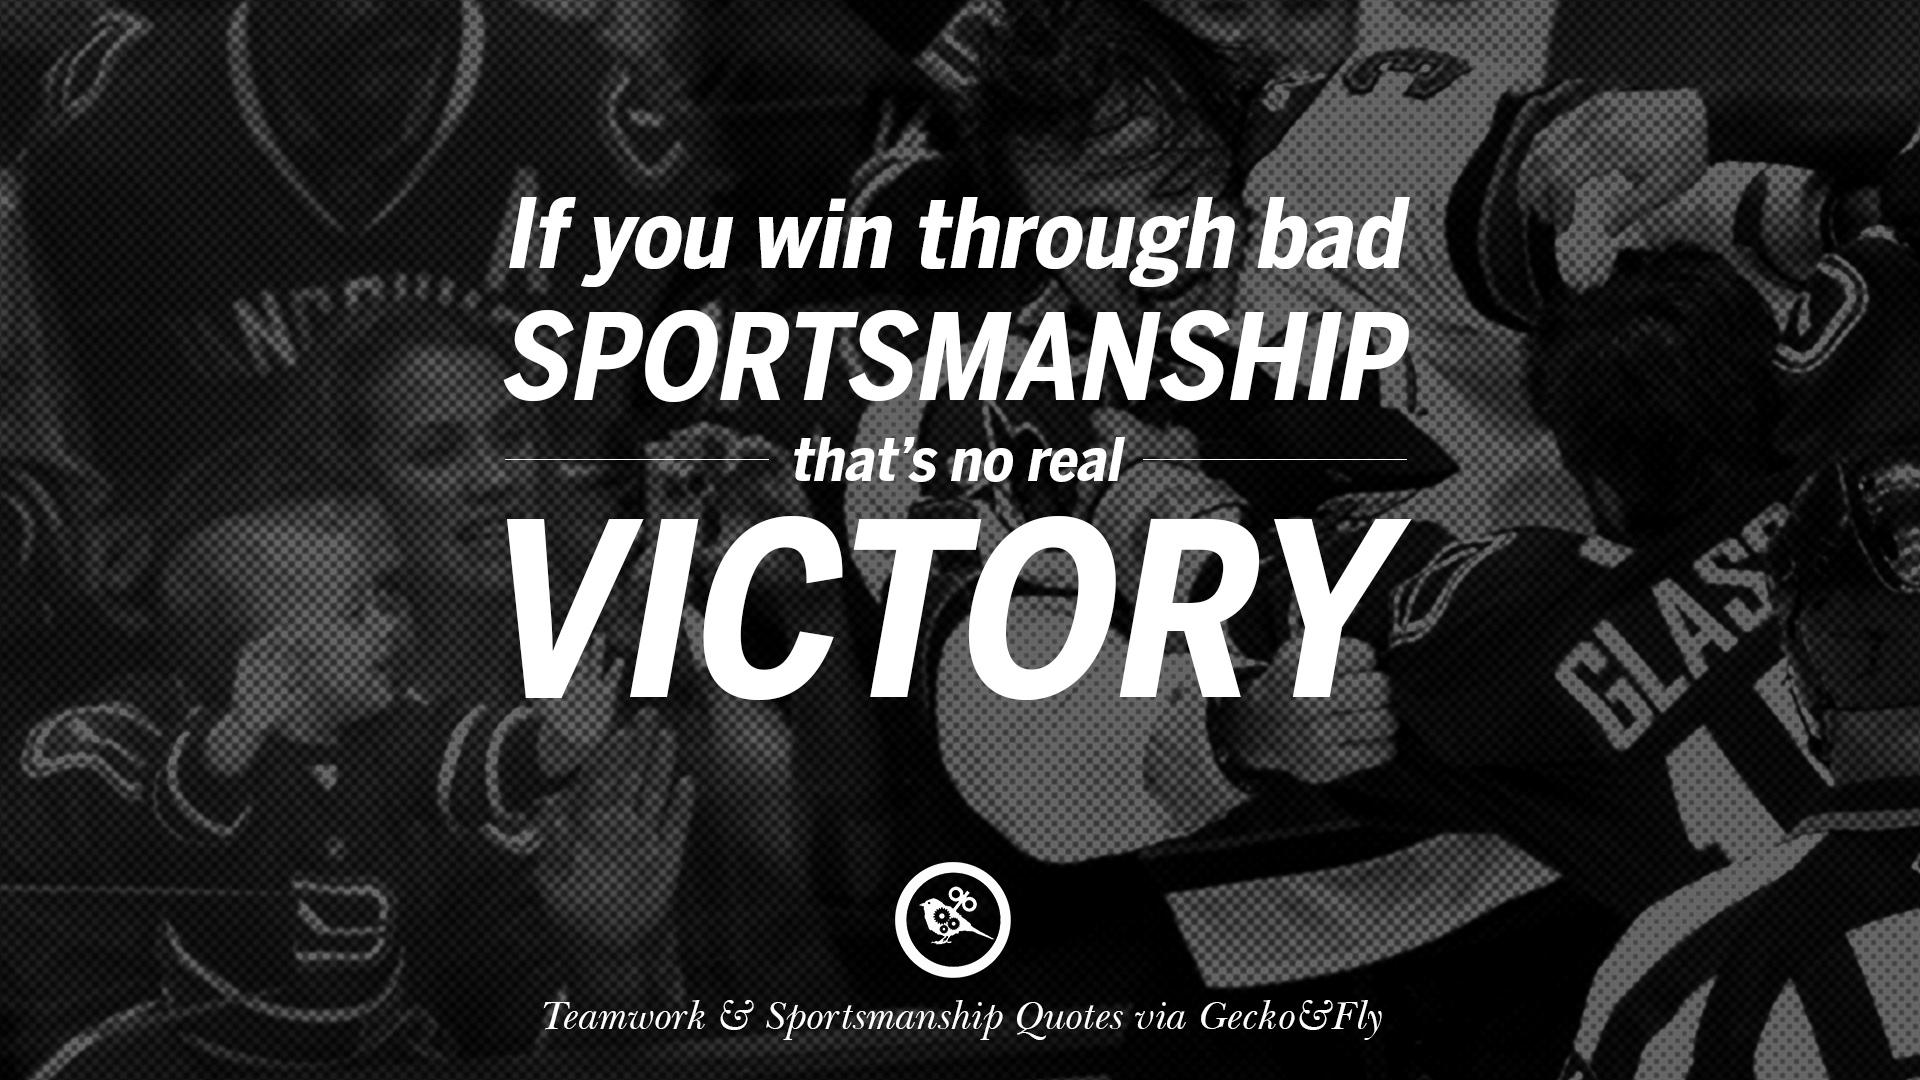 Bad sportsmanship quotes